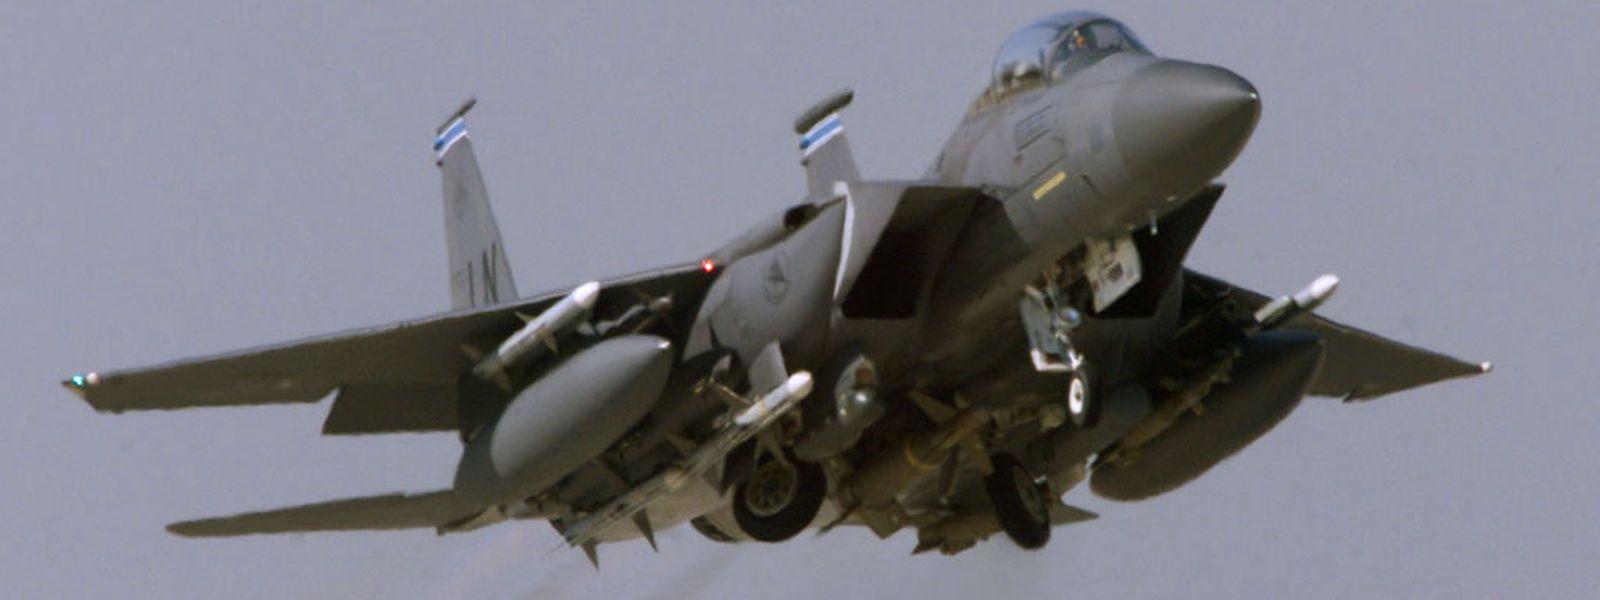 "Ein Kampfjet des Typs McDonnell Douglas F-15 ""Eagle"" der US-Luftwaffe."